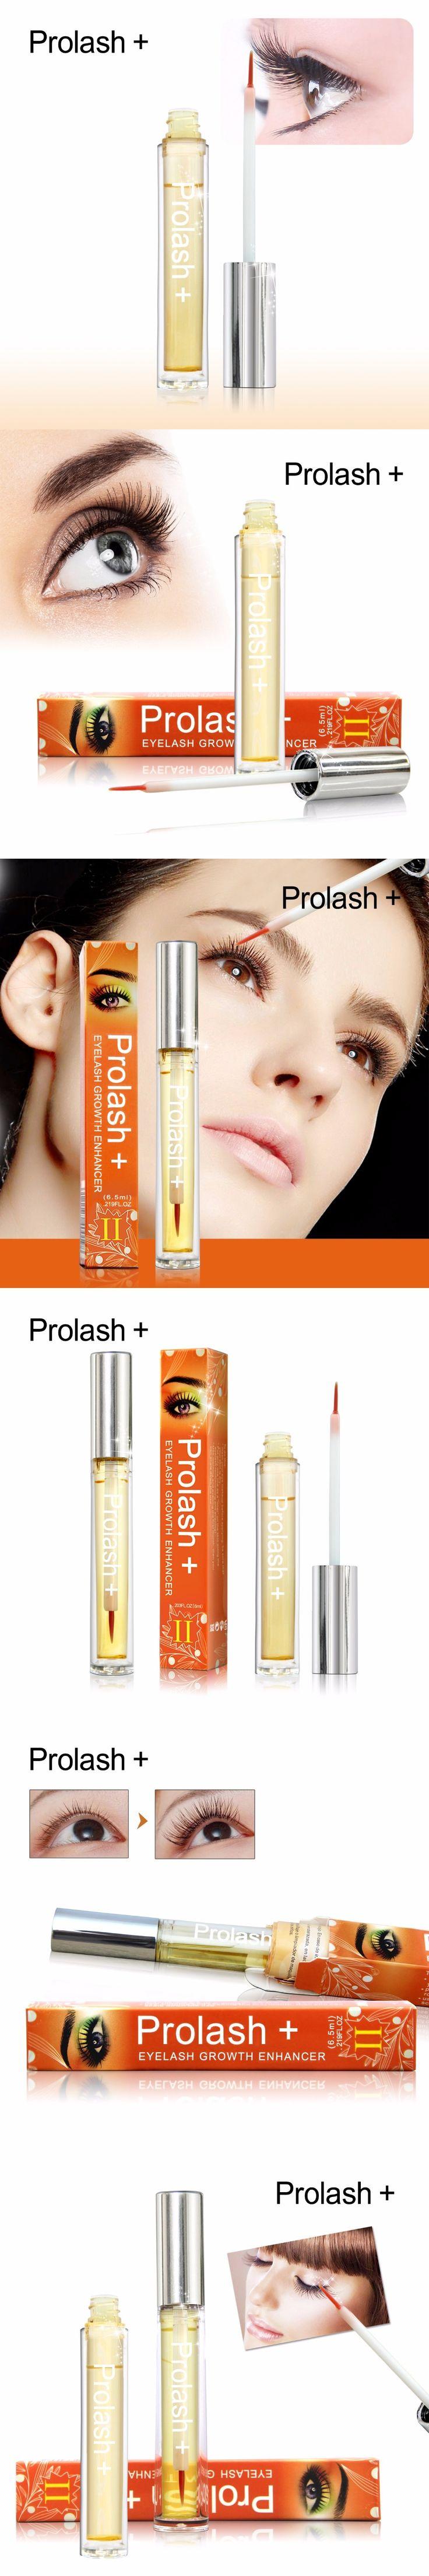 100% natural material approved eyelash enhancer Prolash+ eyelash growth serum factory supply promotional price